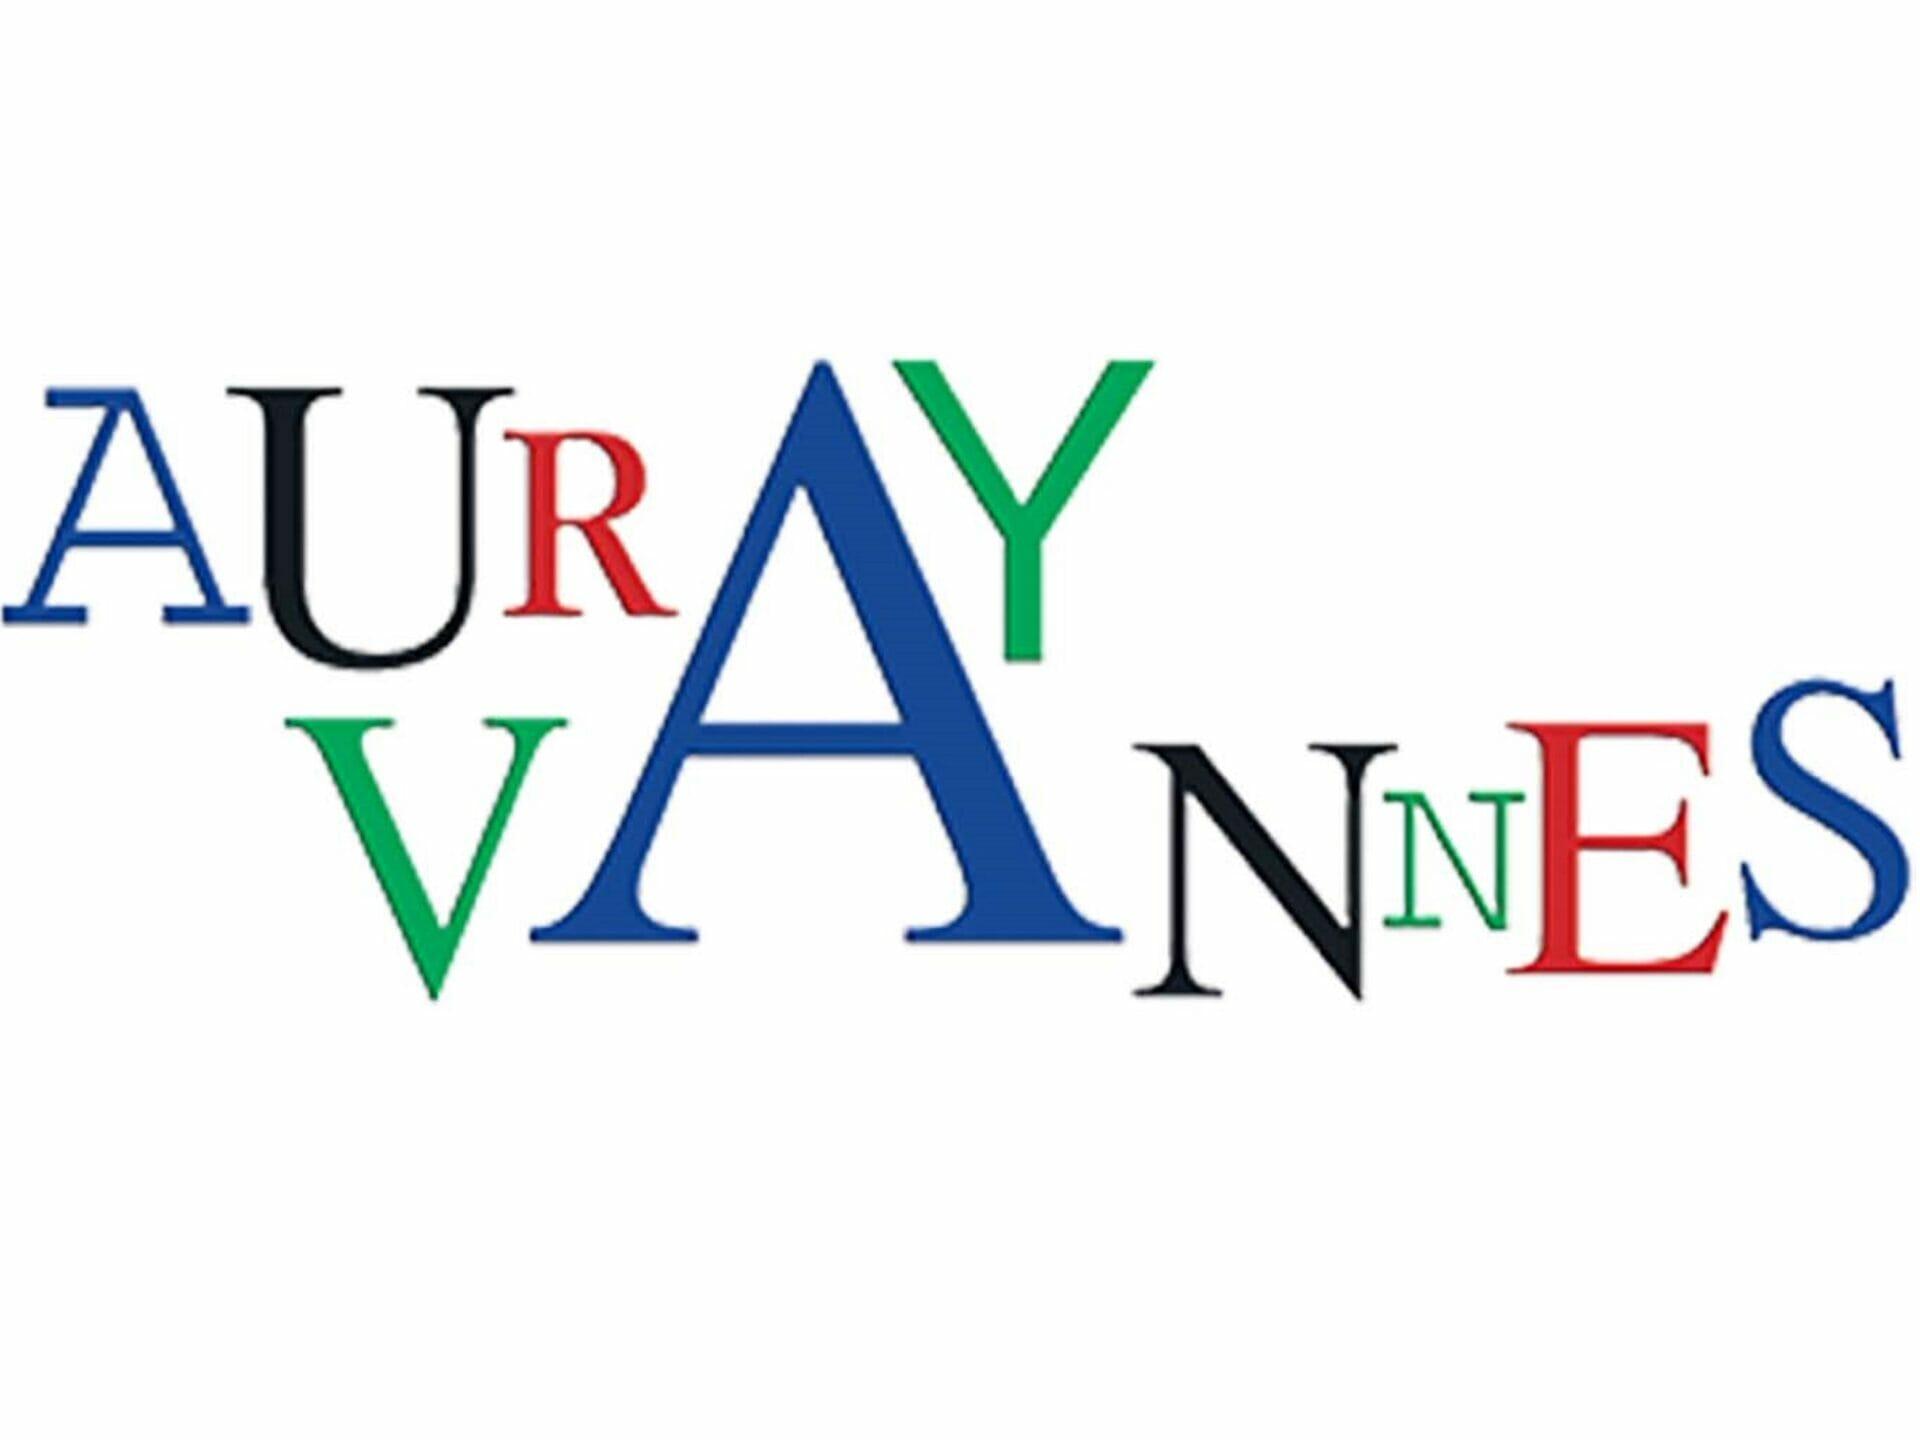 Semi-Marathon Auray-Vannes, 12 septembre 2021